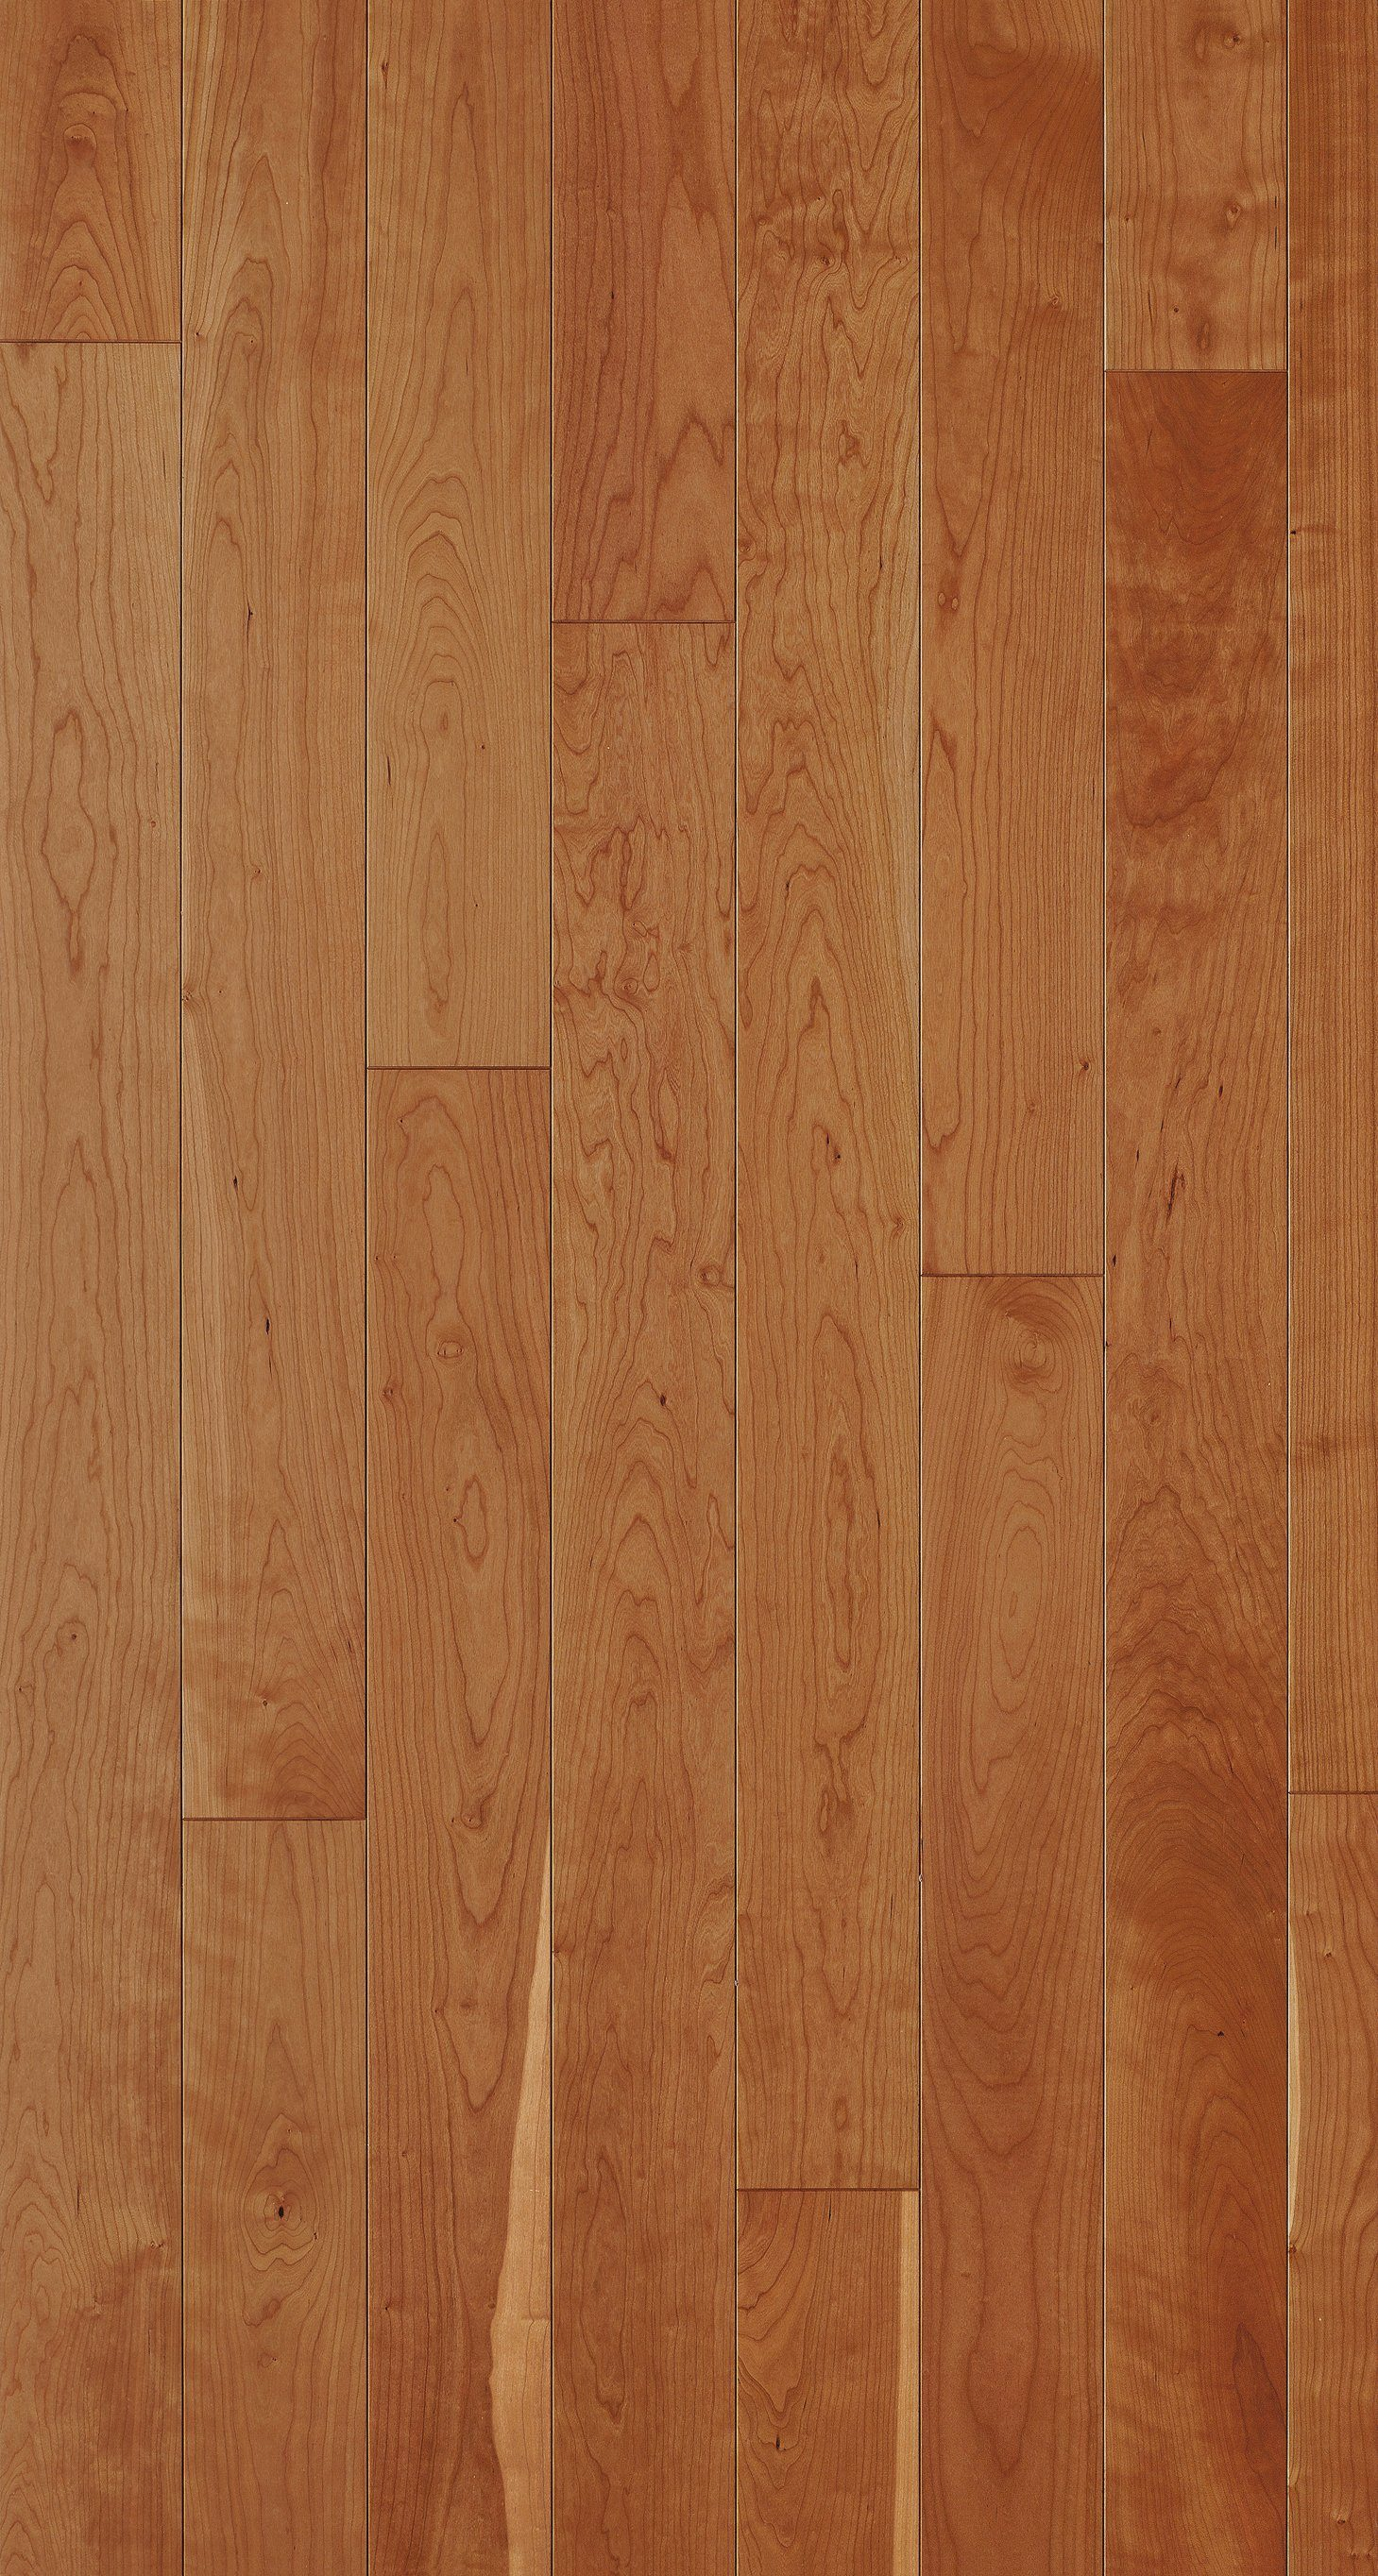 PARADOR Parkett »Trendtime 4 Natur - Kirsche amerik.«, 2010 x 160 mm, Stärke: 13 mm, 2,89 m²